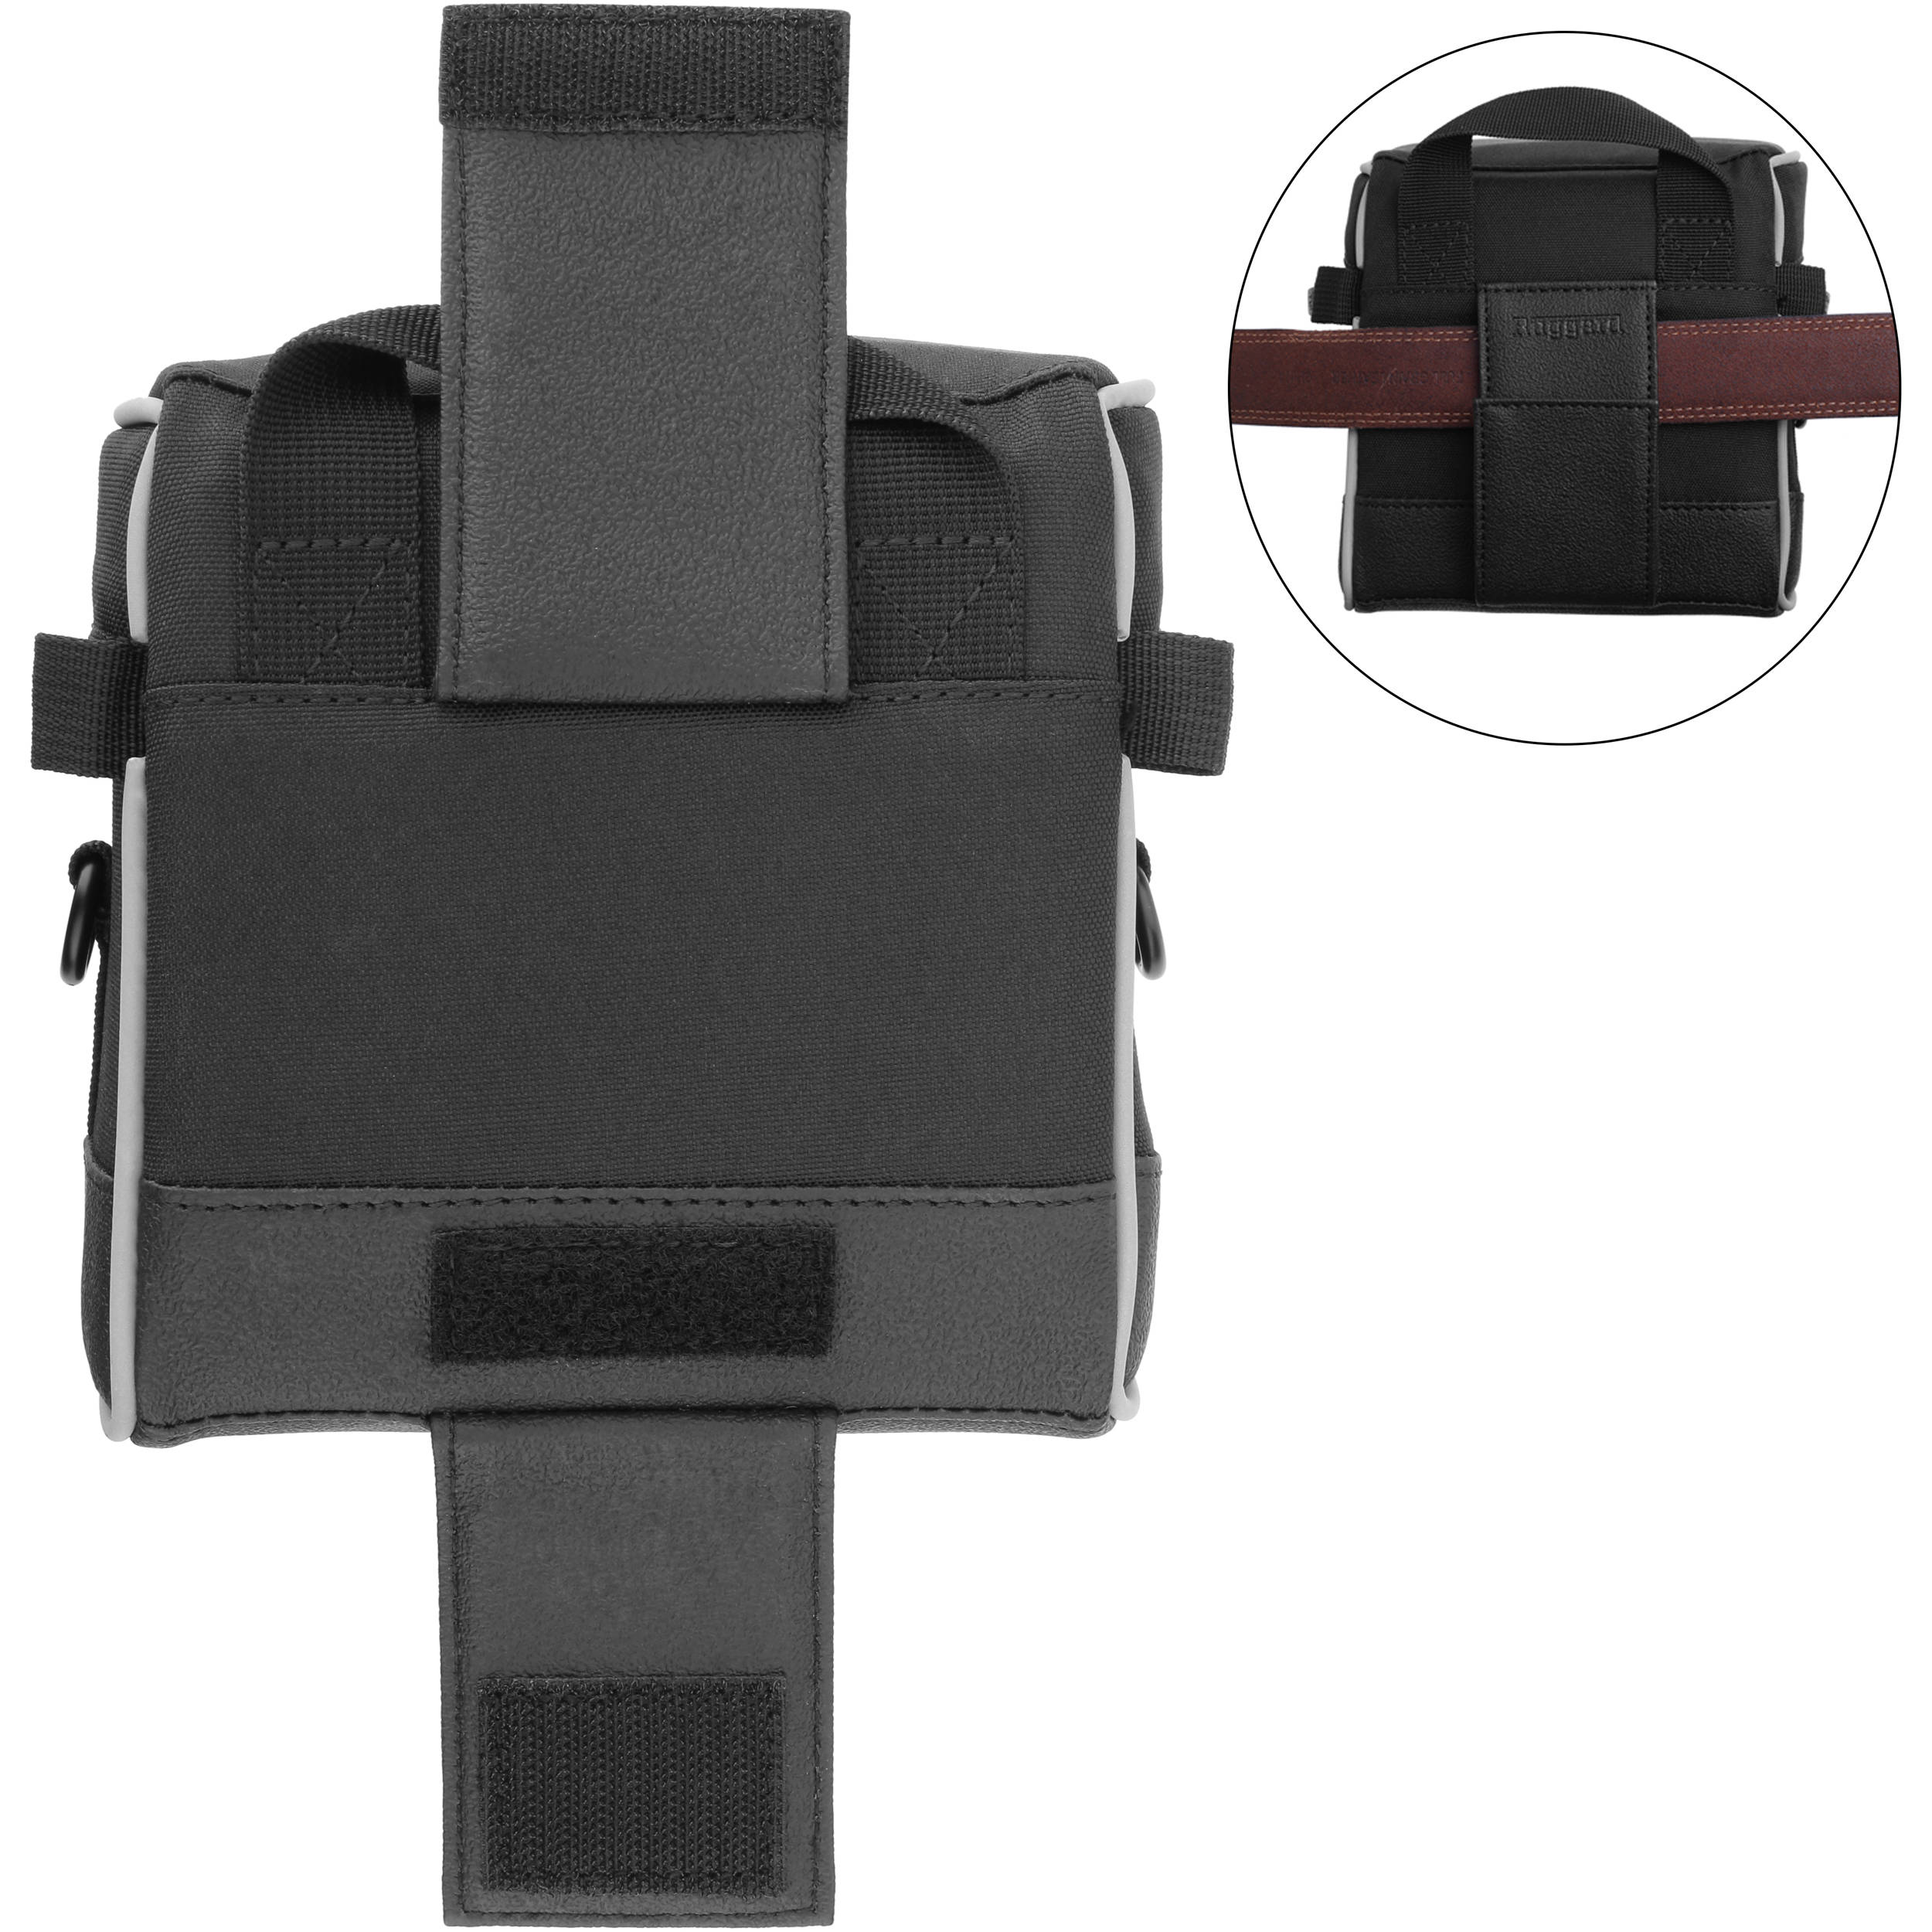 Black 2 Pack Ruggard Lens Case 10.5 x 4.5